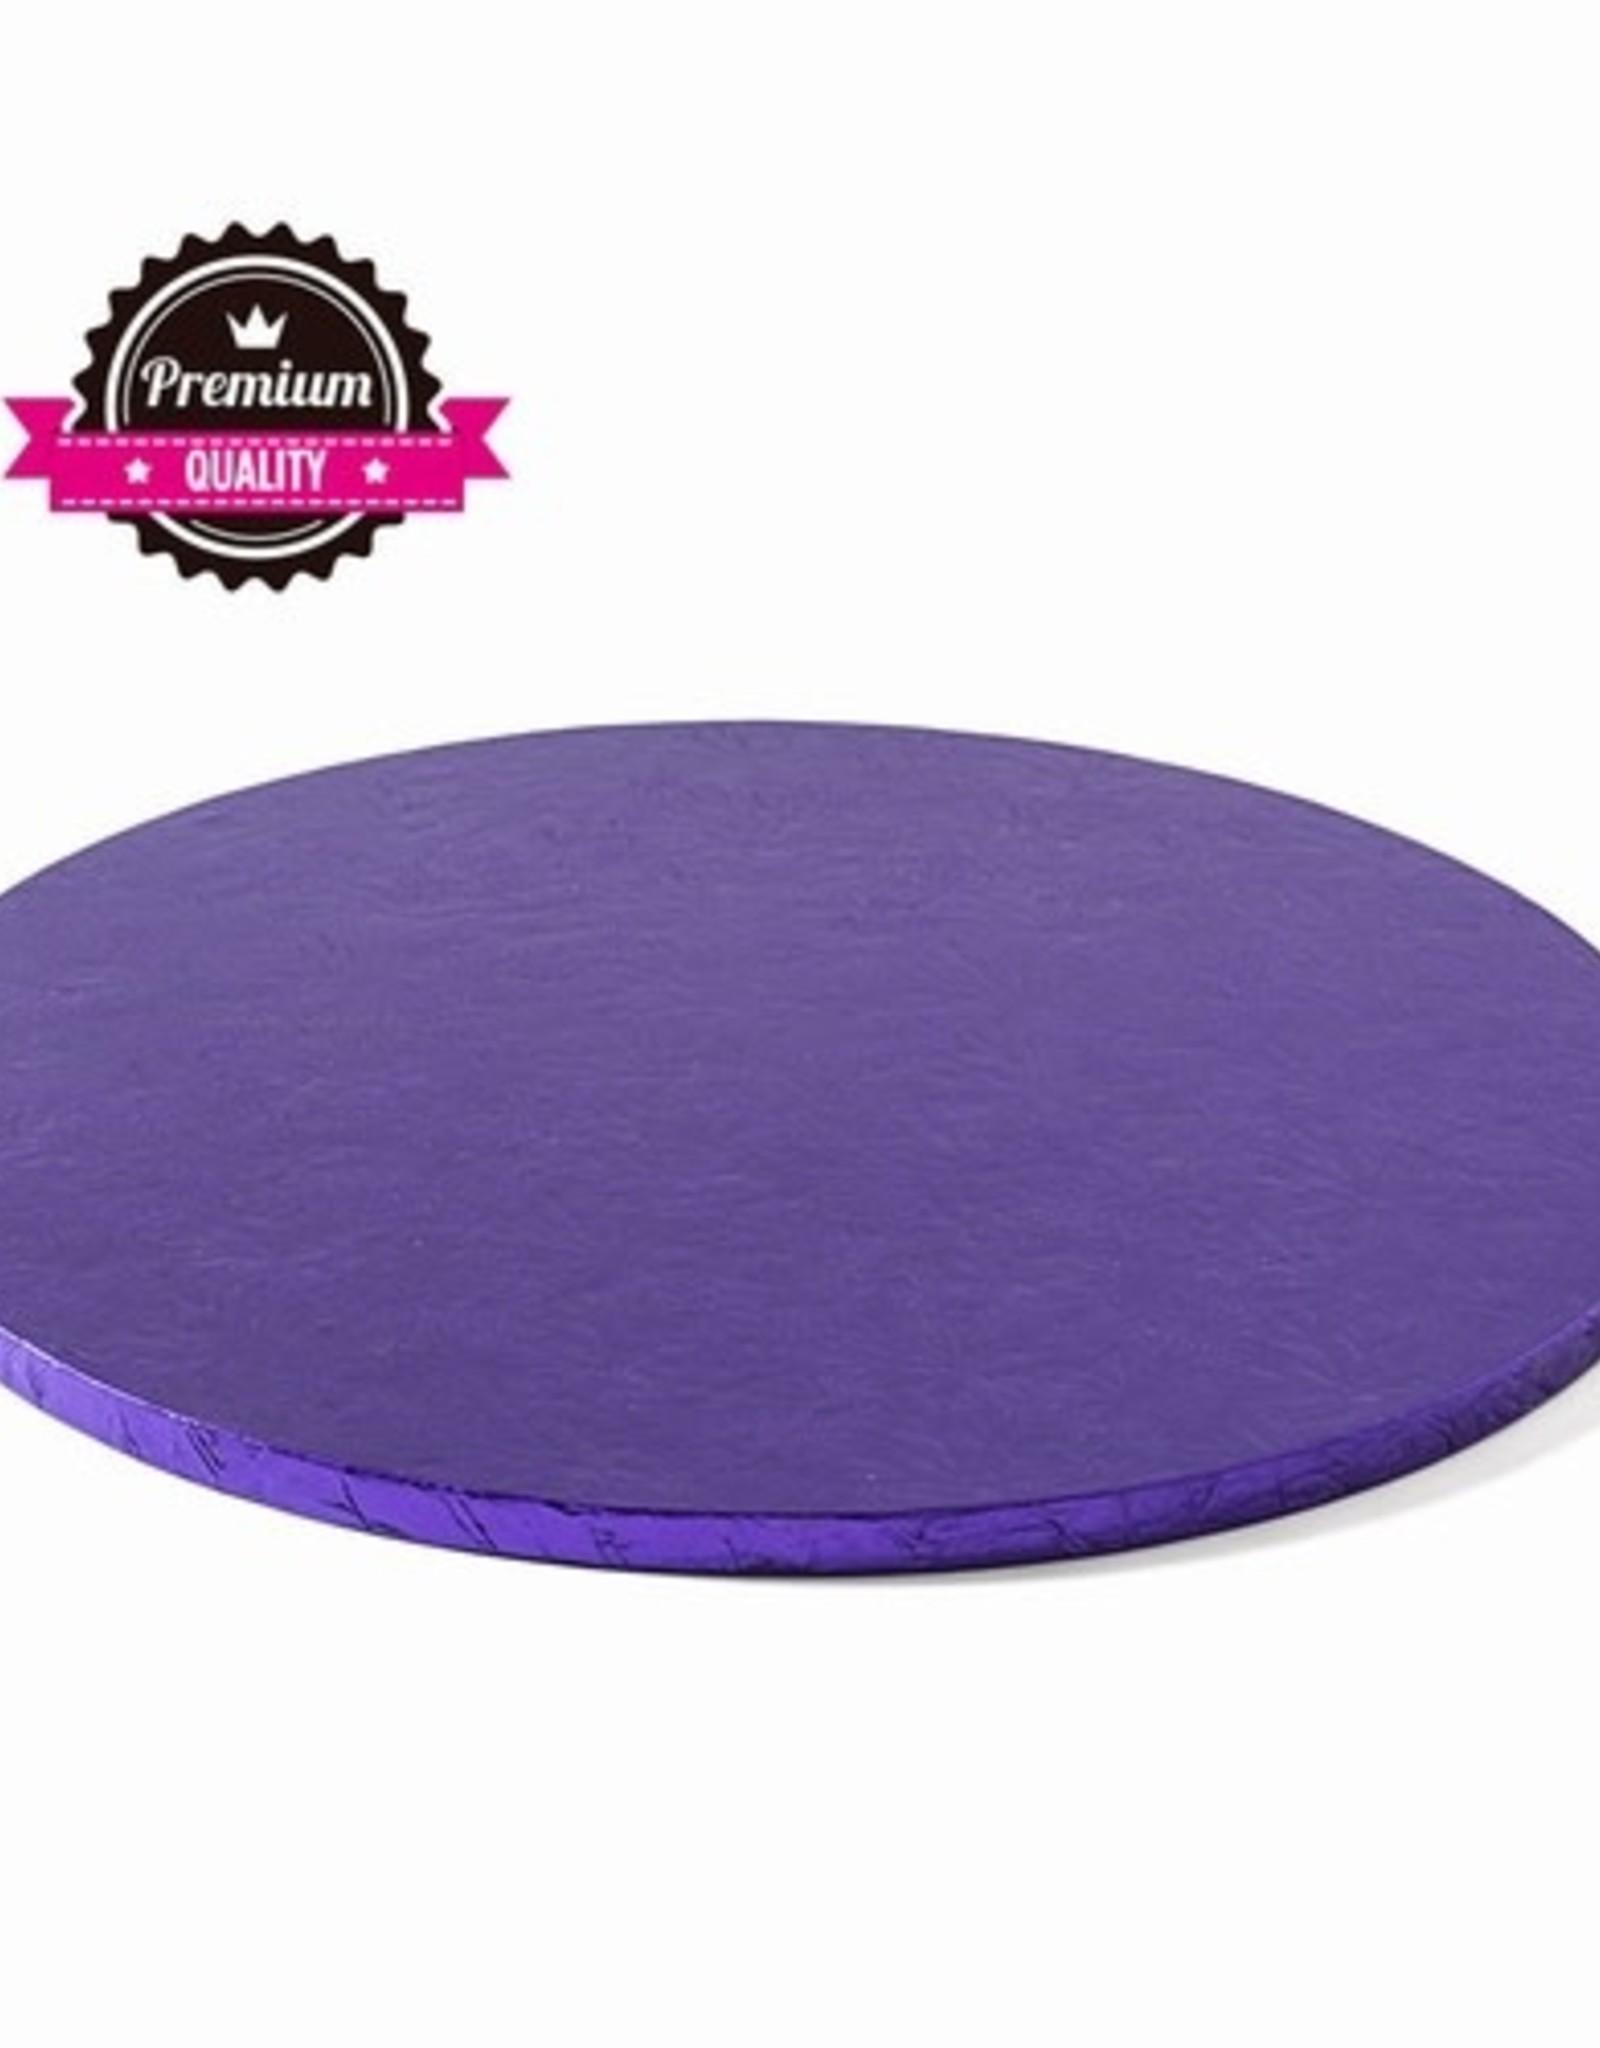 Decora Cake Drum Rond Ø40cm Violet